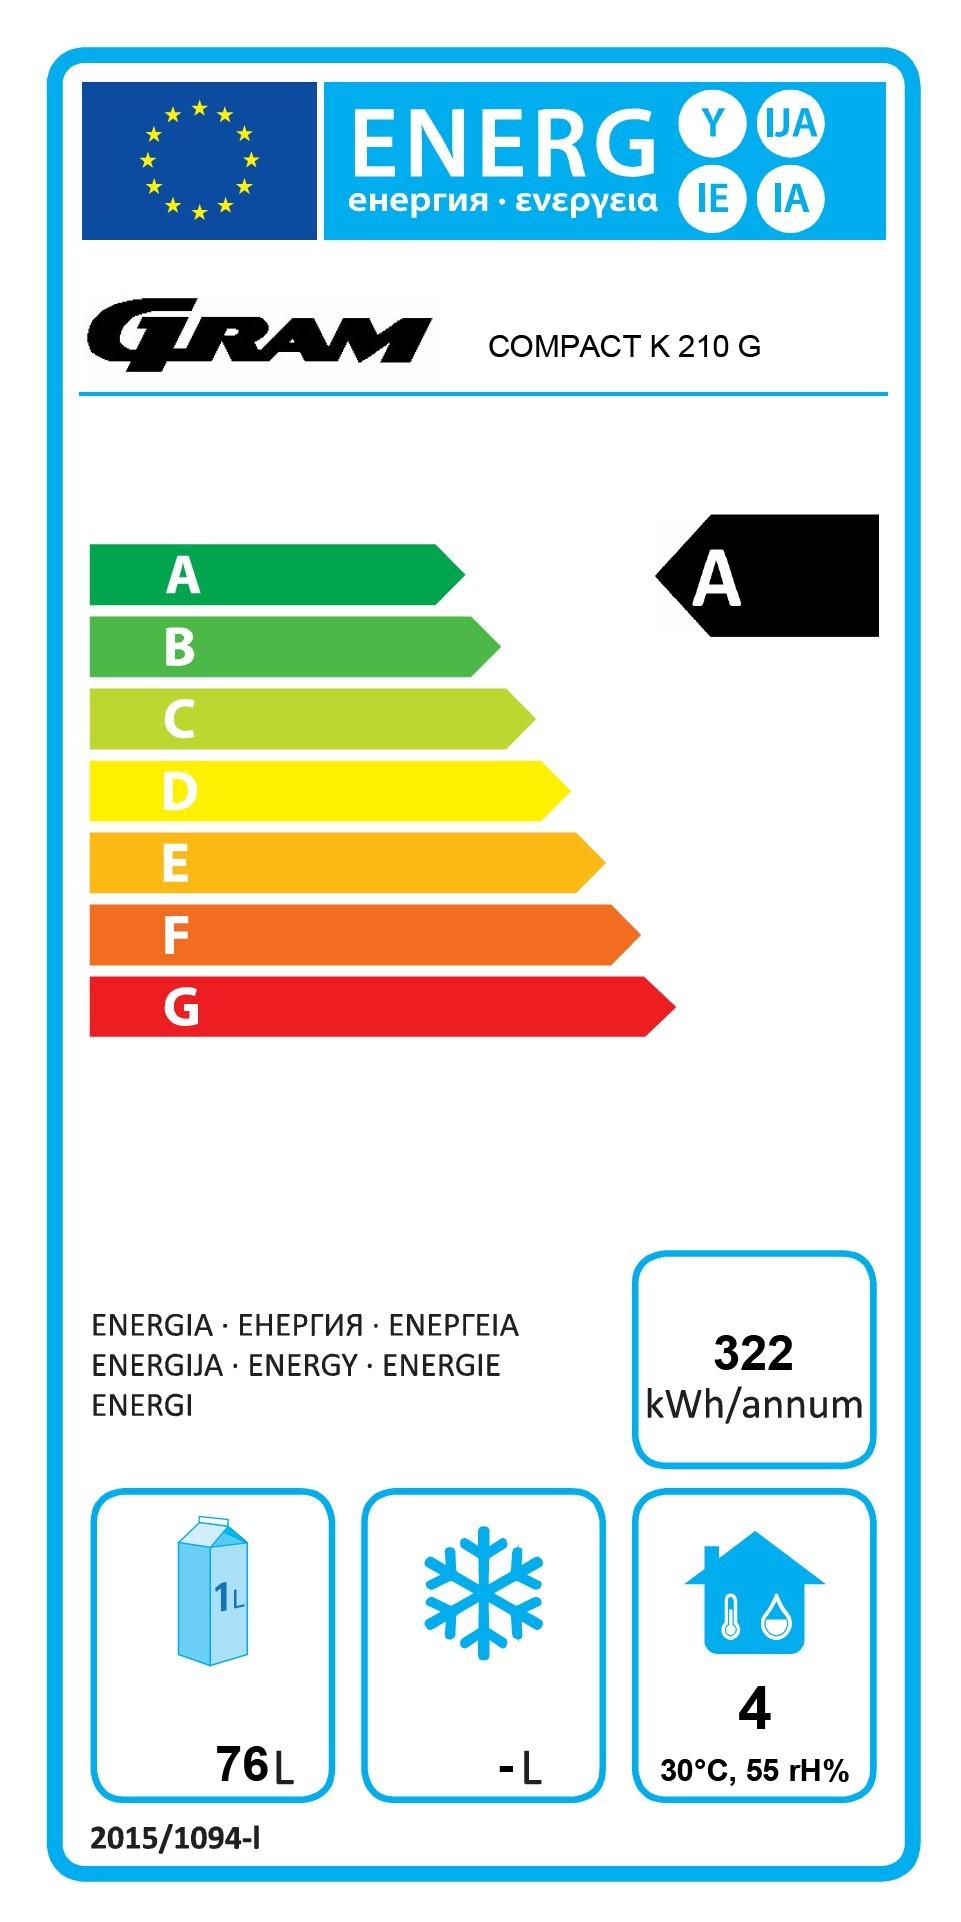 COMPACT KG 210 LG 3W 125 Ltr Undercounter Glass Door Fridge Energy Rating